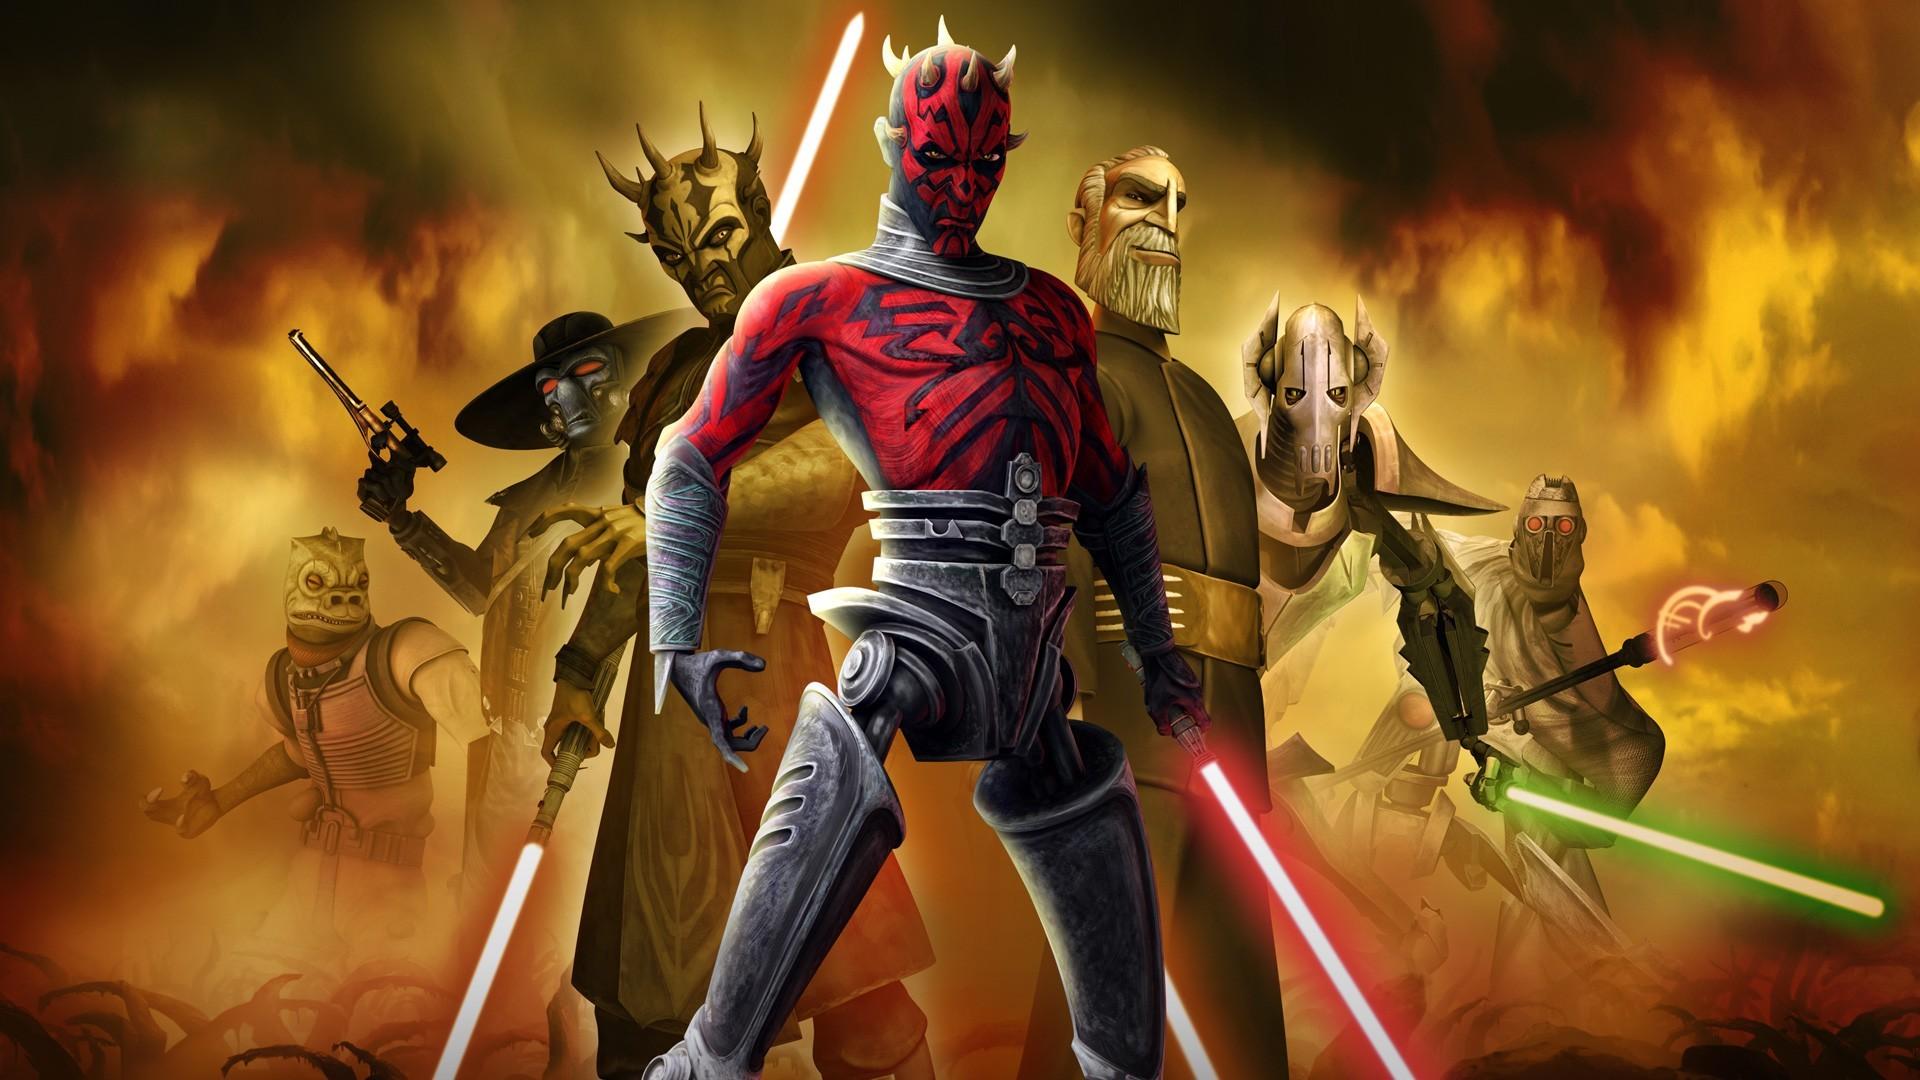 General Grievous · TV Show – Star Wars: The Clone Wars Darth Maul Bossk  (Star Wars)